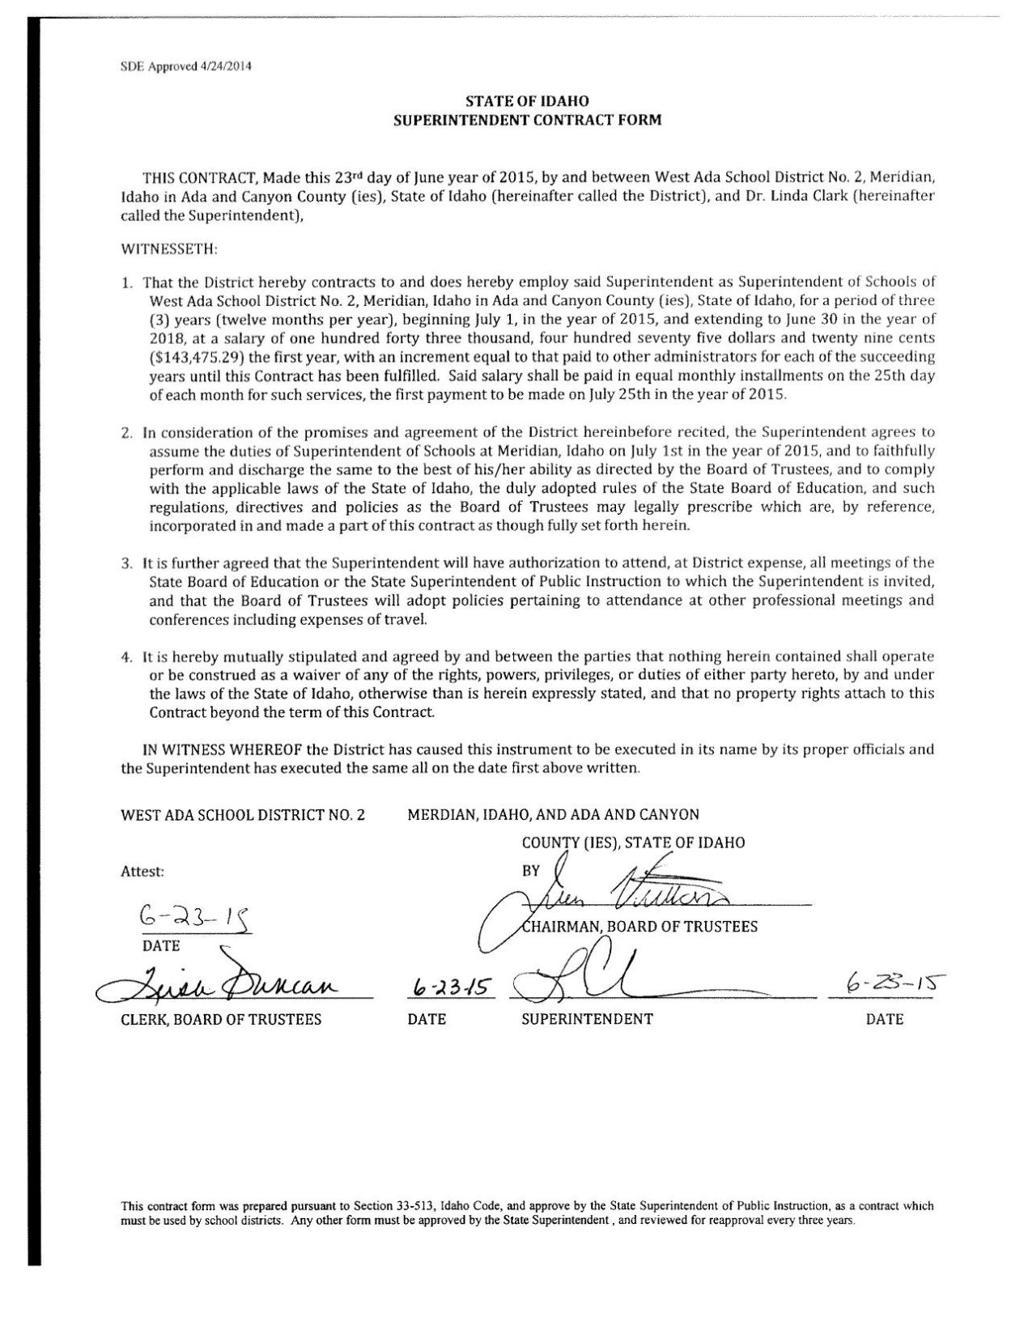 West Ada Trustees Terminate Clark S Contract On Grounds Of